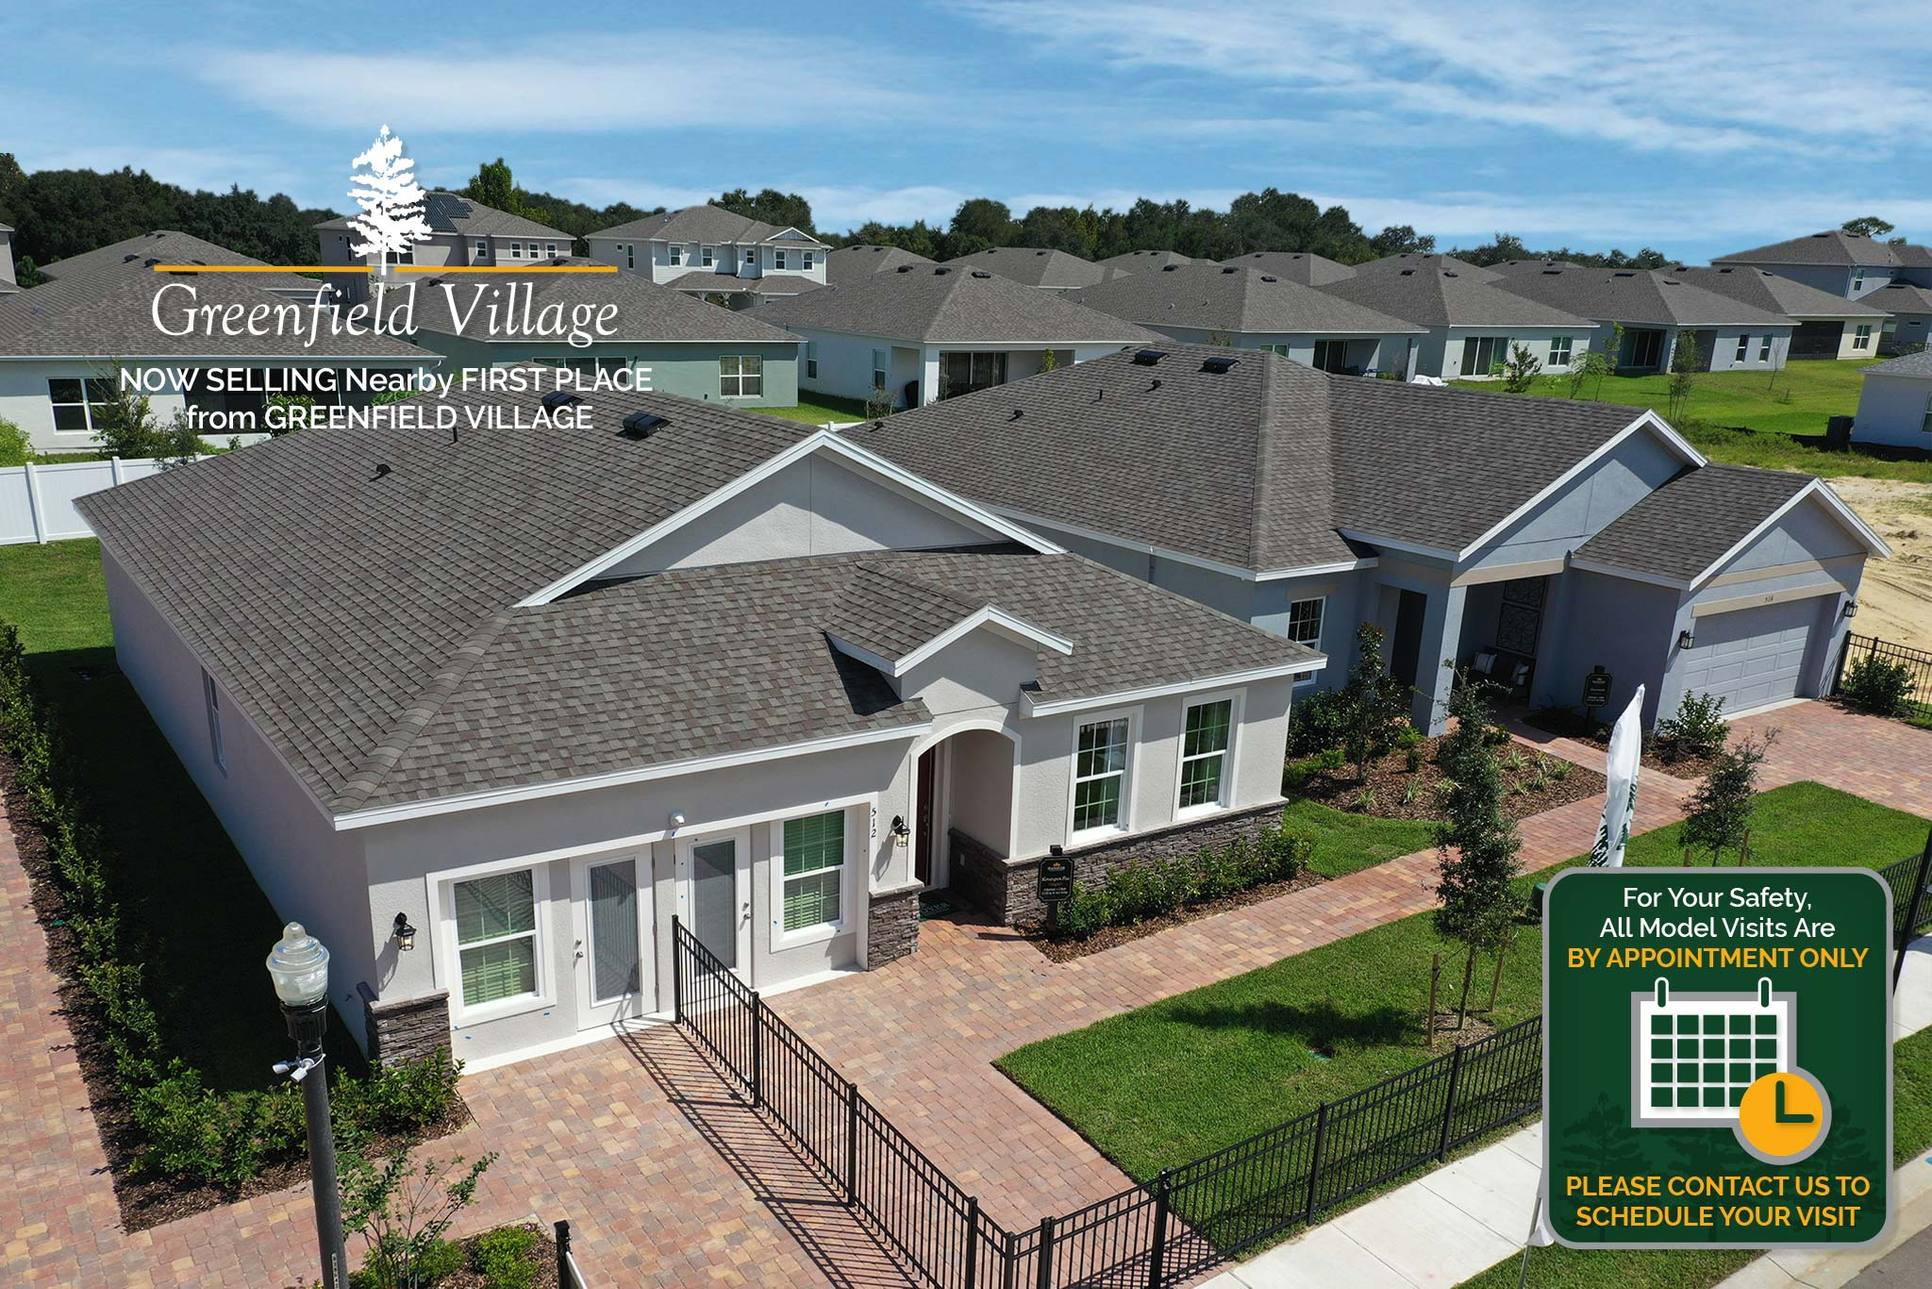 Stunning Model Homes at Greenfield Village